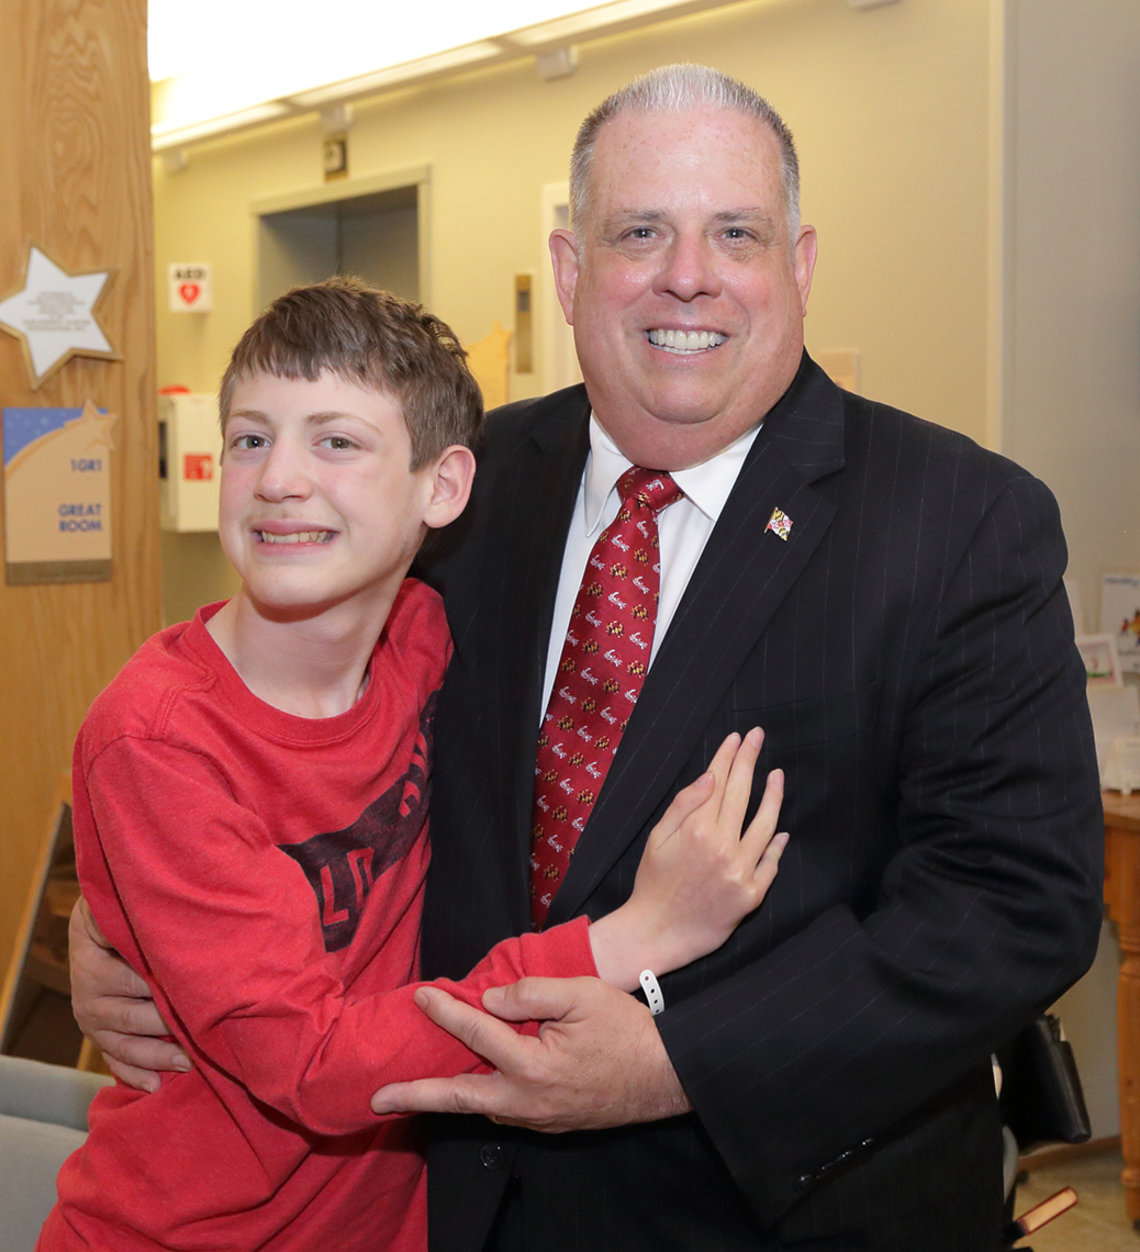 Hogan hugs young patient